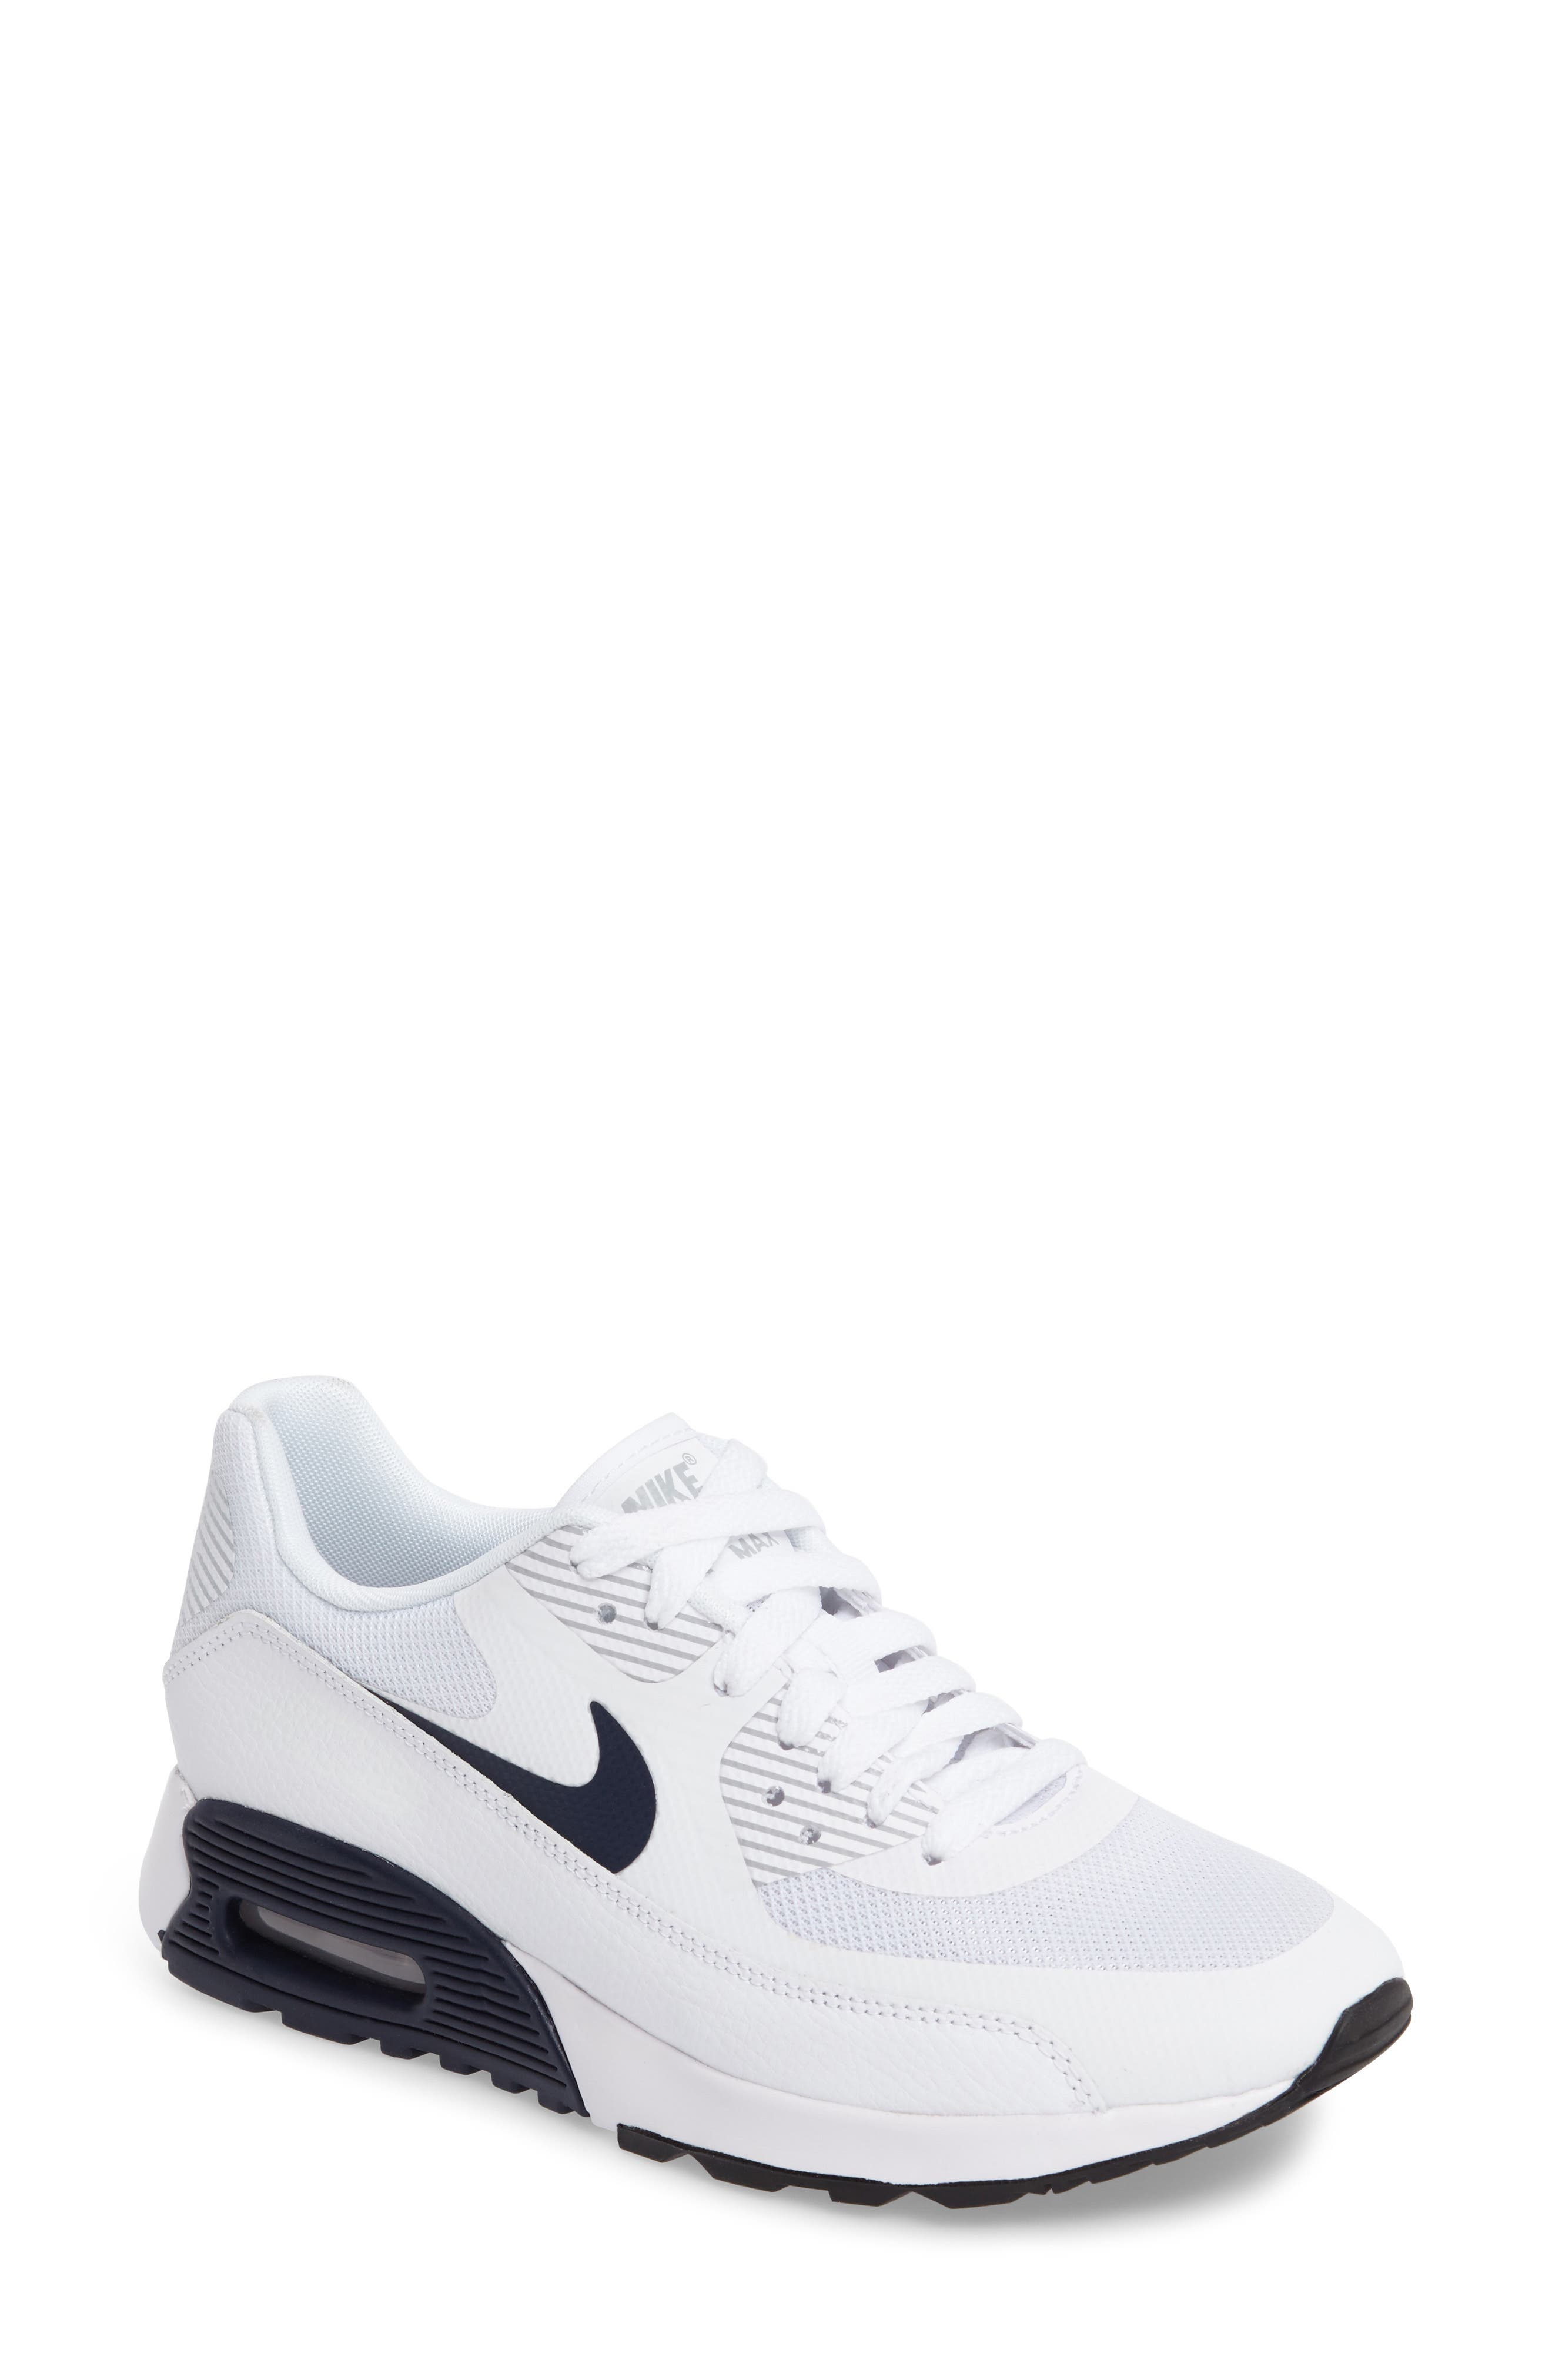 Nike Air Max 90 Ultra 2.0 Sneaker (Women)